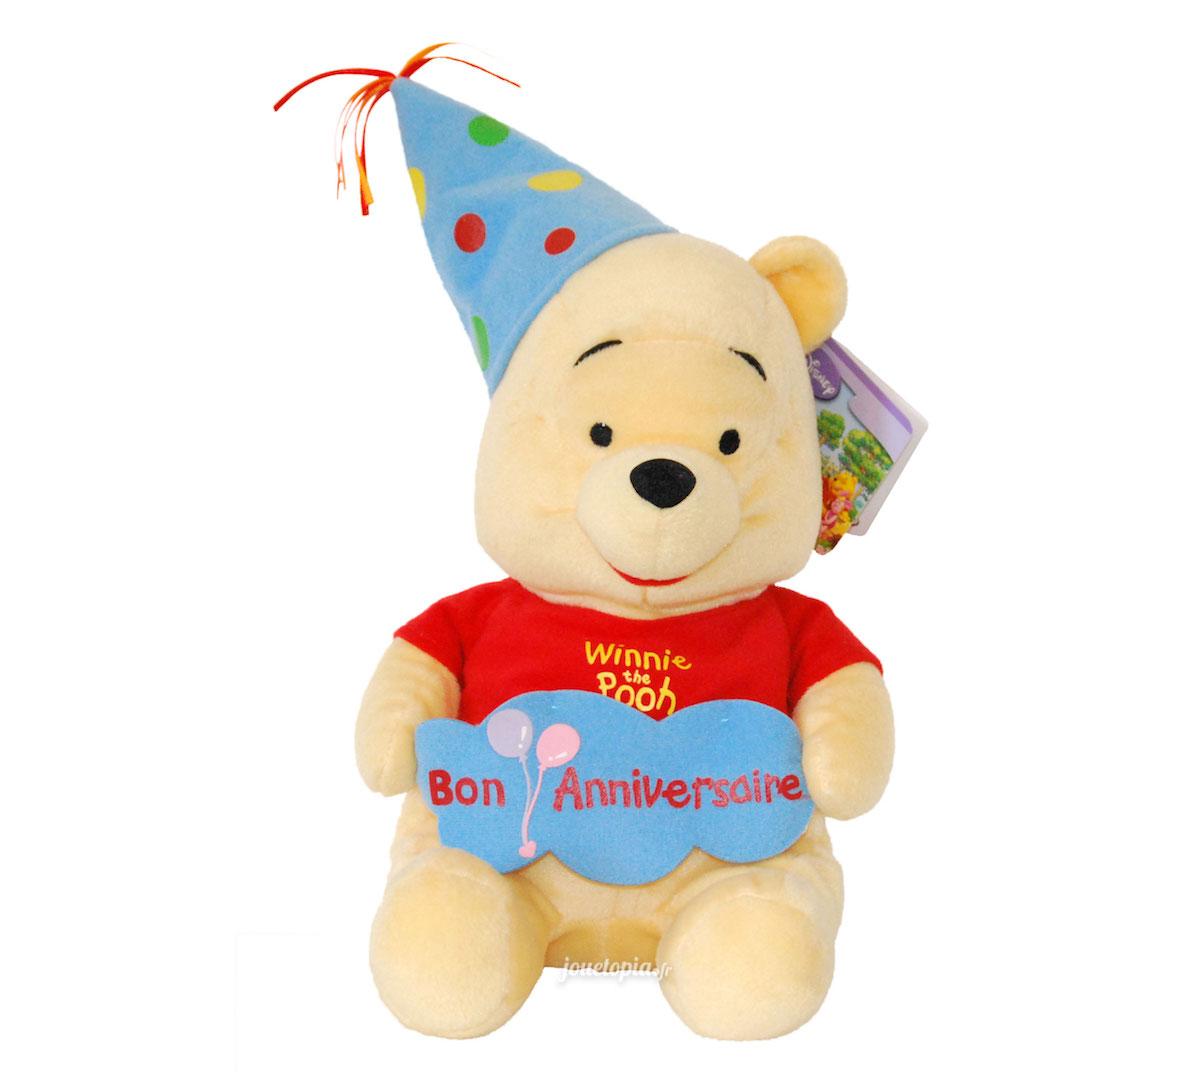 Peluche Winnie Lourson Bon Anniversaire Disney